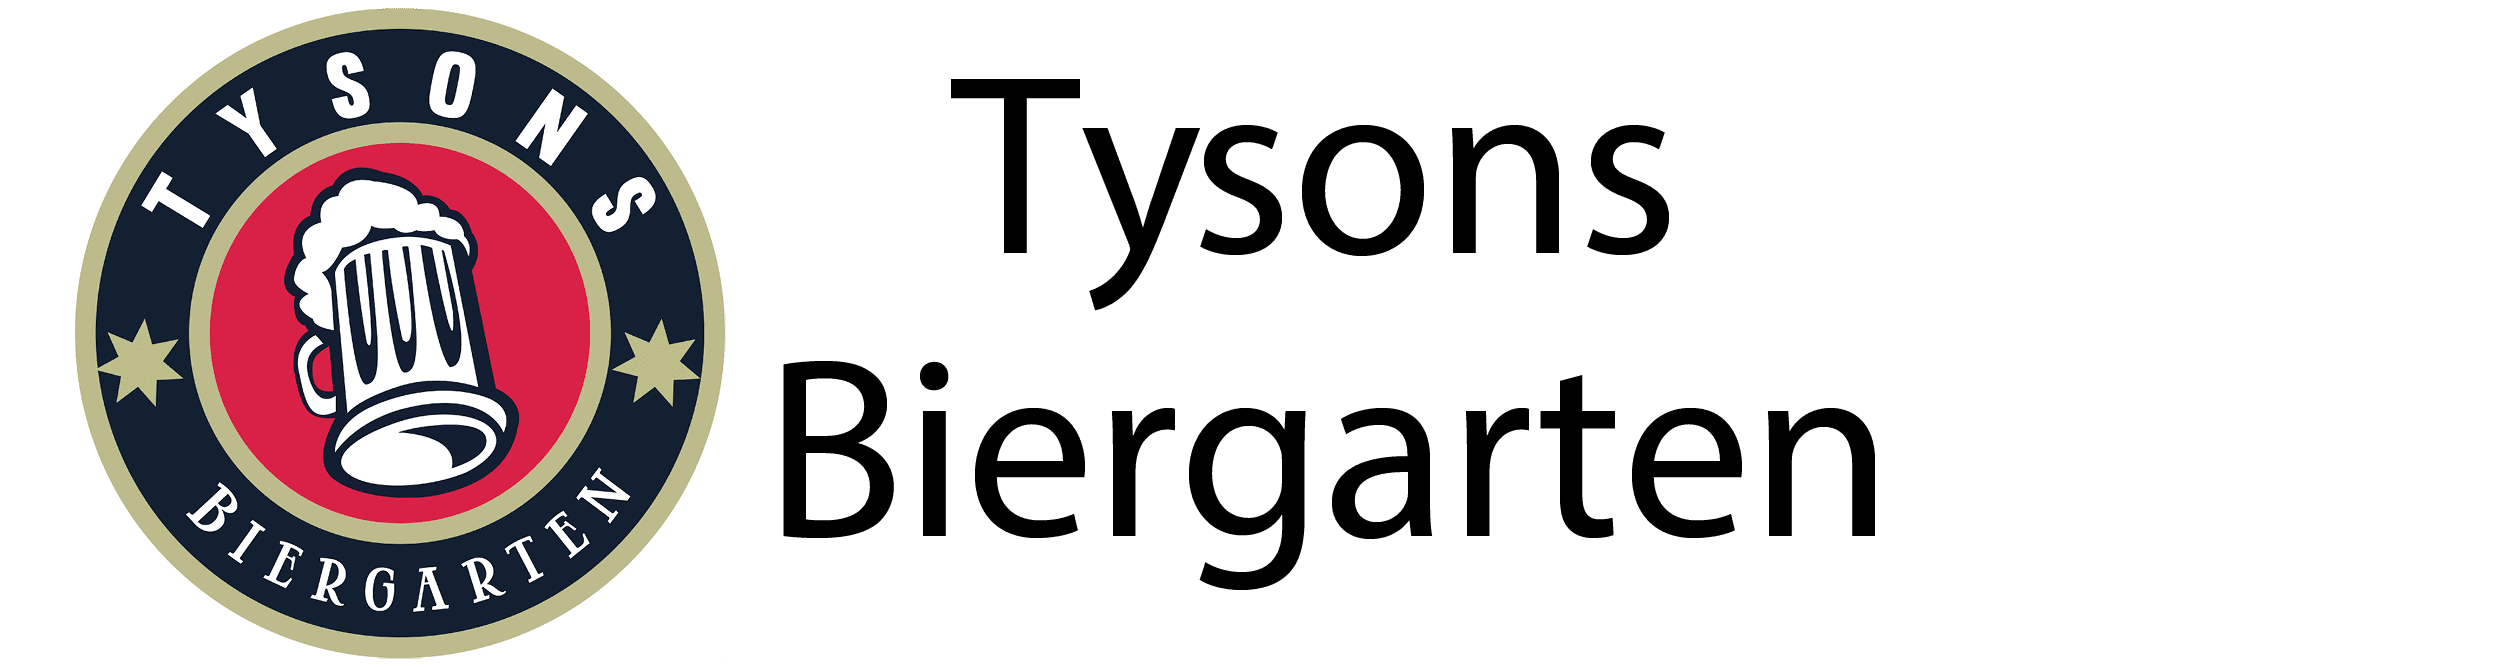 Tyson's Biergarten